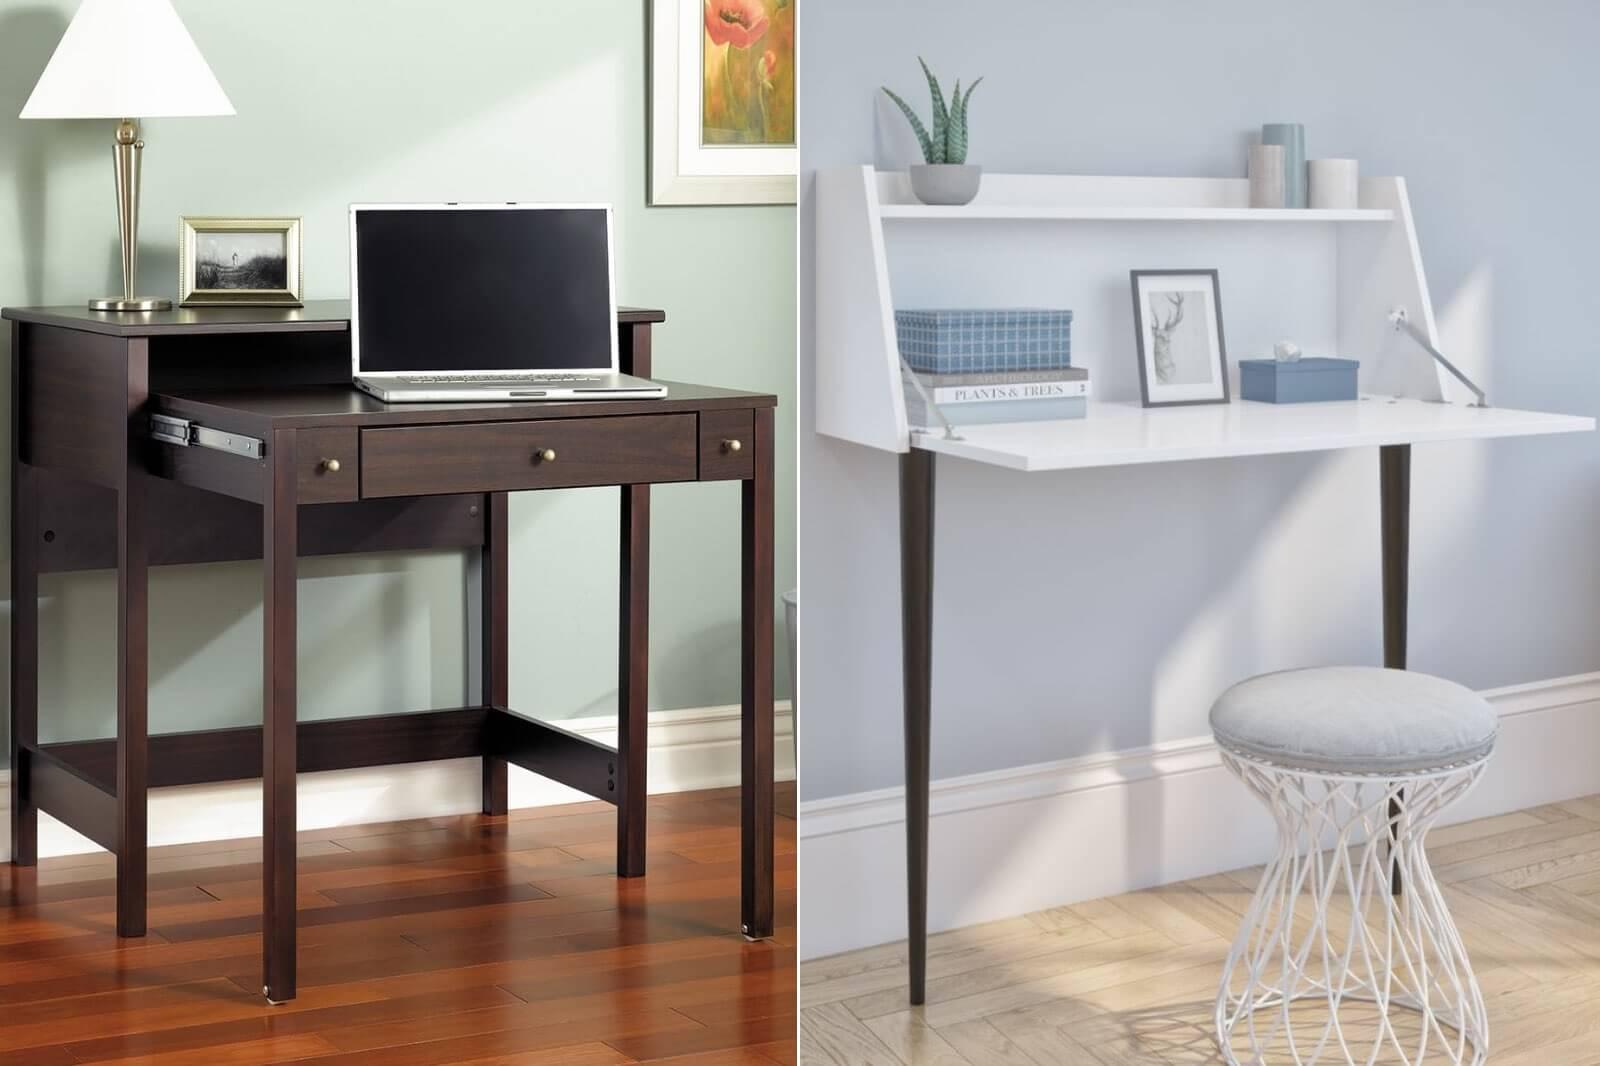 Bestar secretary desk with Bush Furniture pull out desk